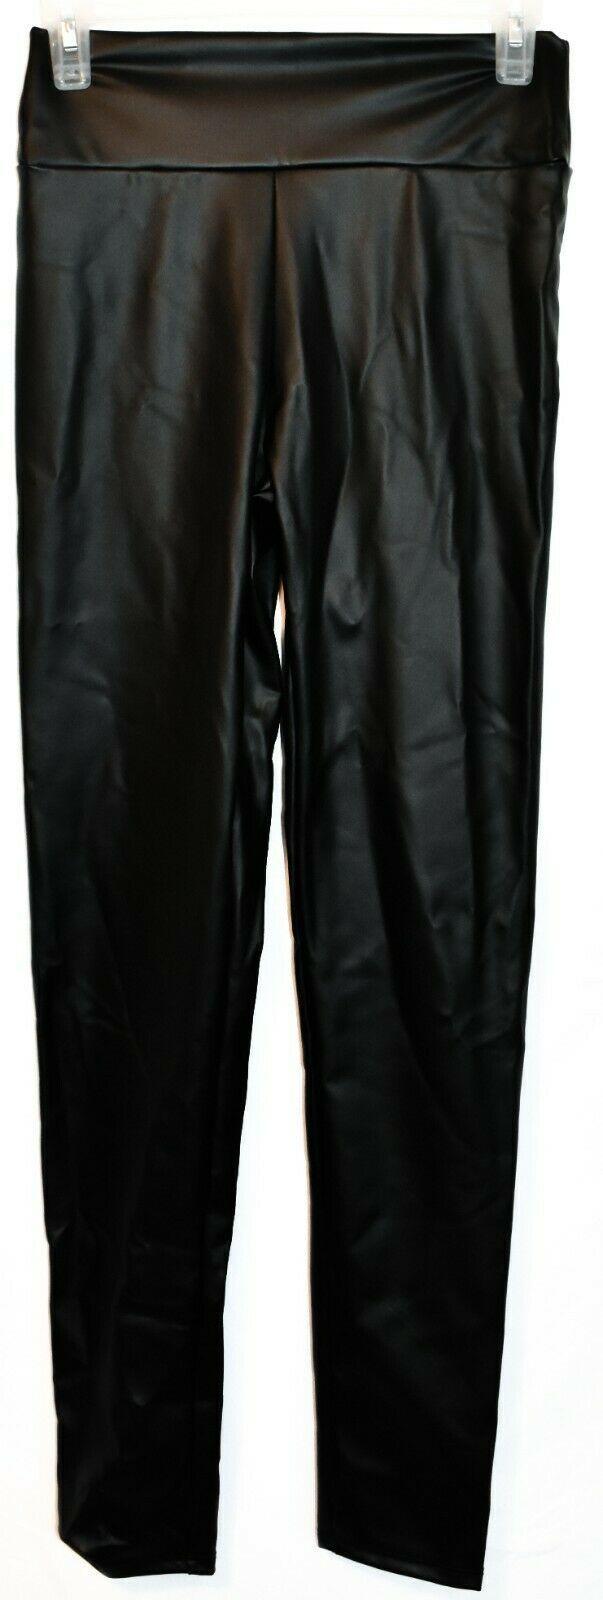 Windsor Women's Black Faux Leather High-Rise Upgrade Ya Liquid Leggings S NWT